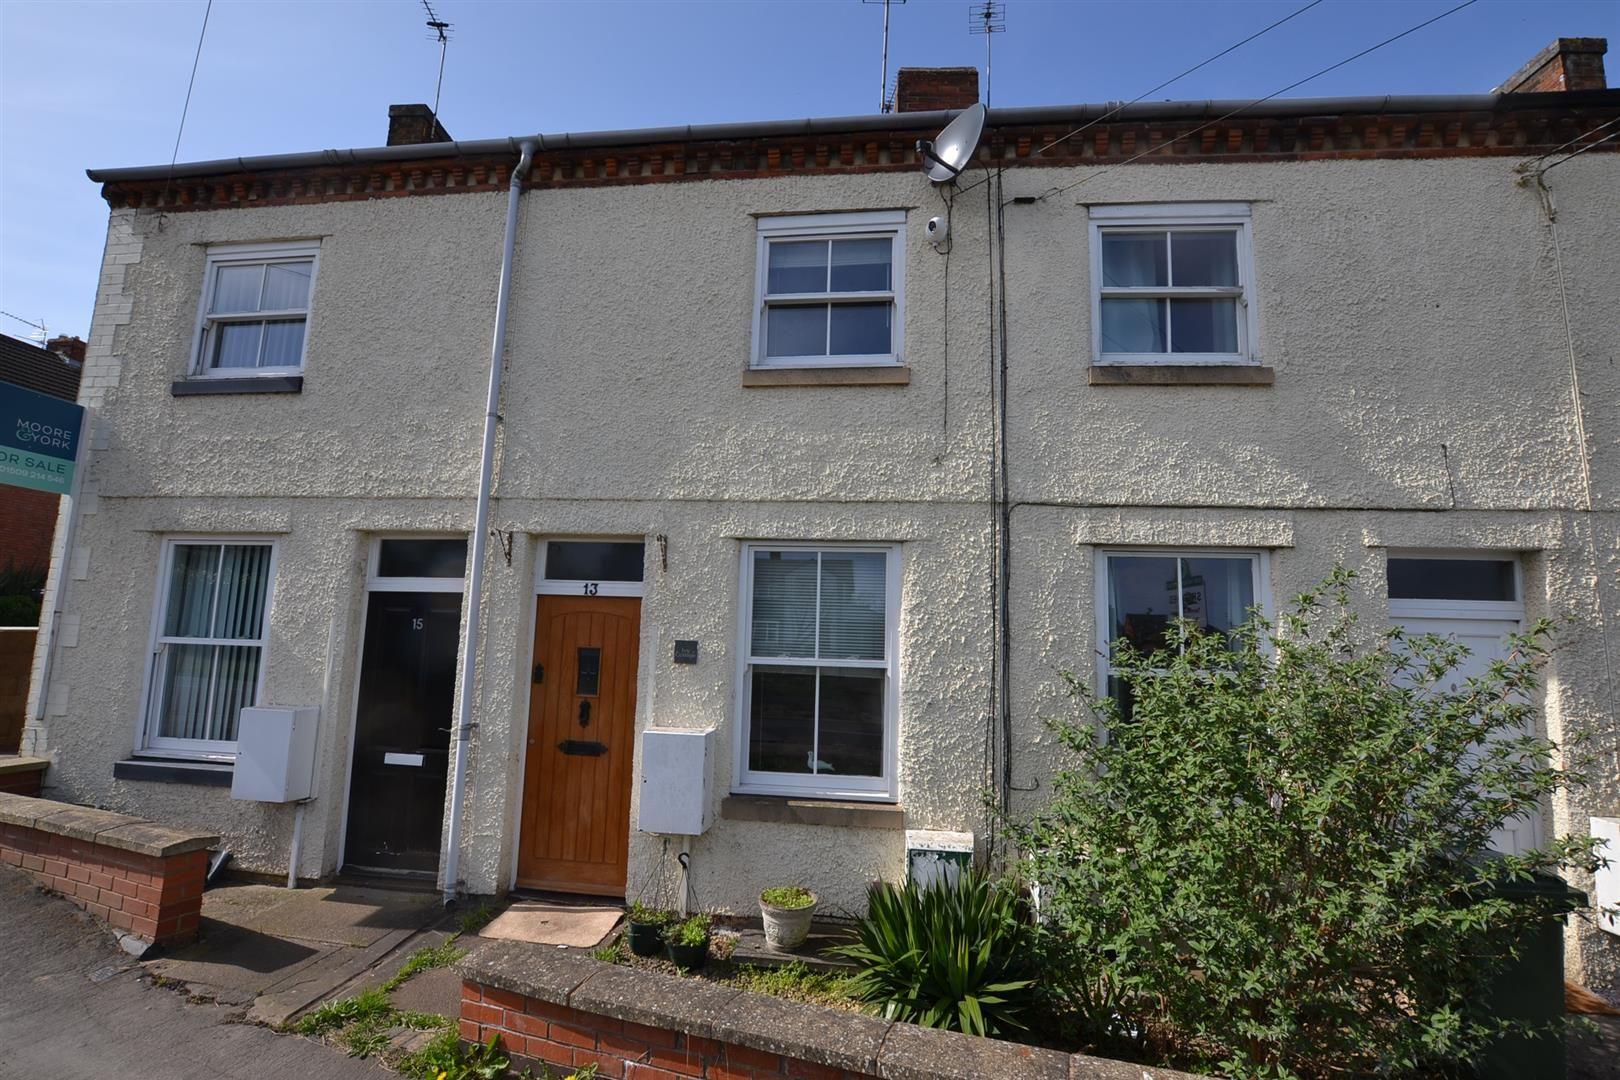 Property photo 1 of 17. Dsc_0167.Jpg